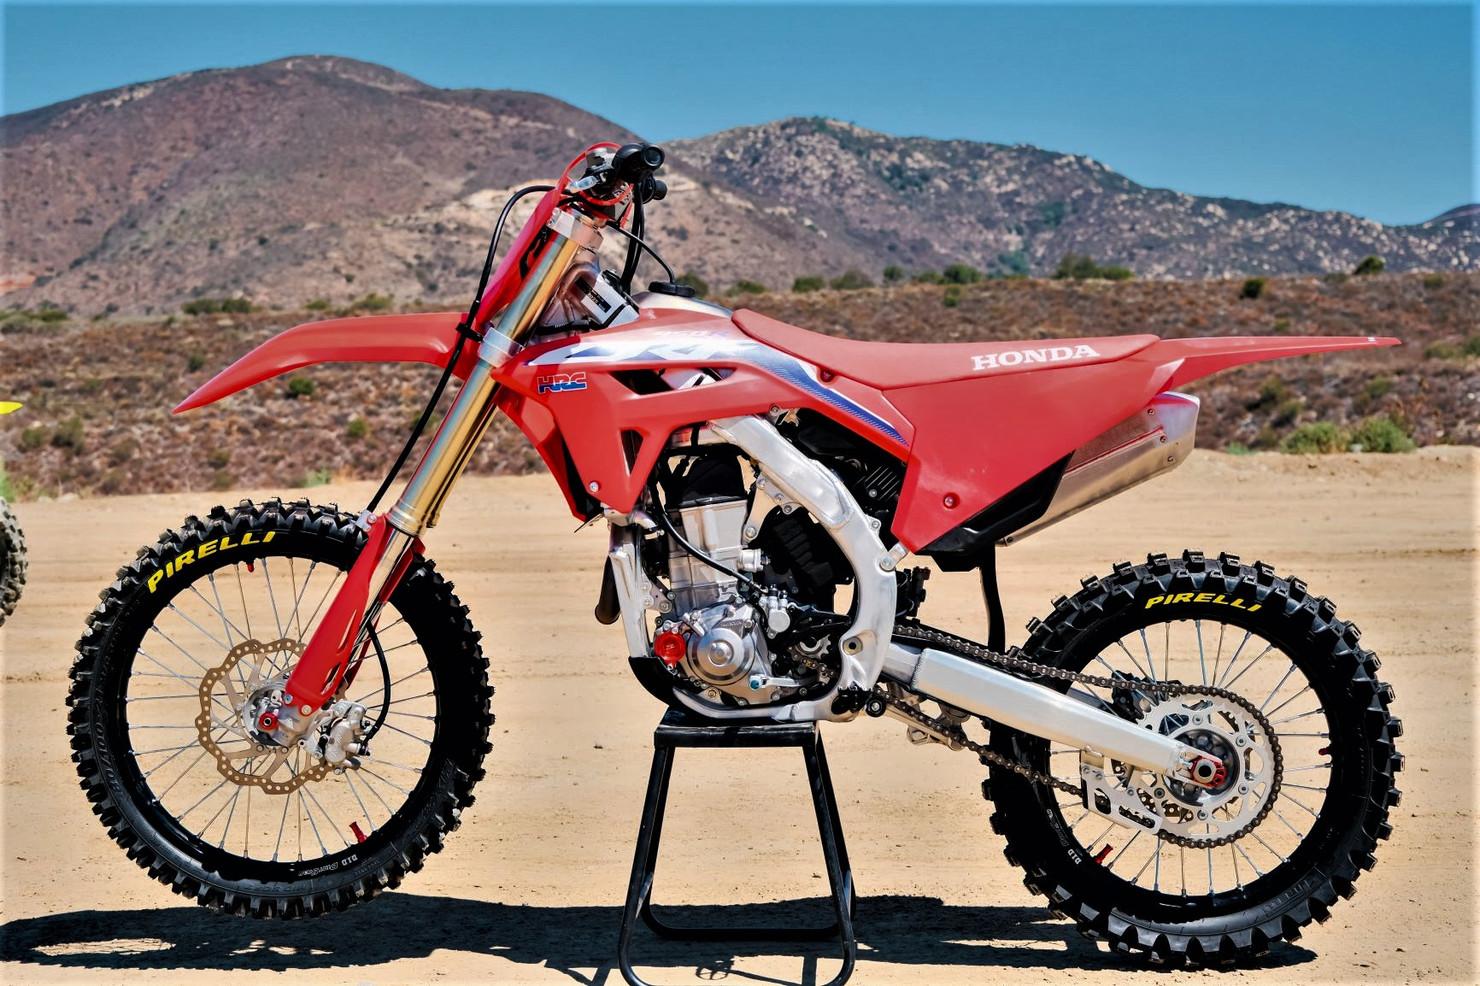 Honda CRF 450R 2022, Teste Exclusivo, Revista Dirt Action